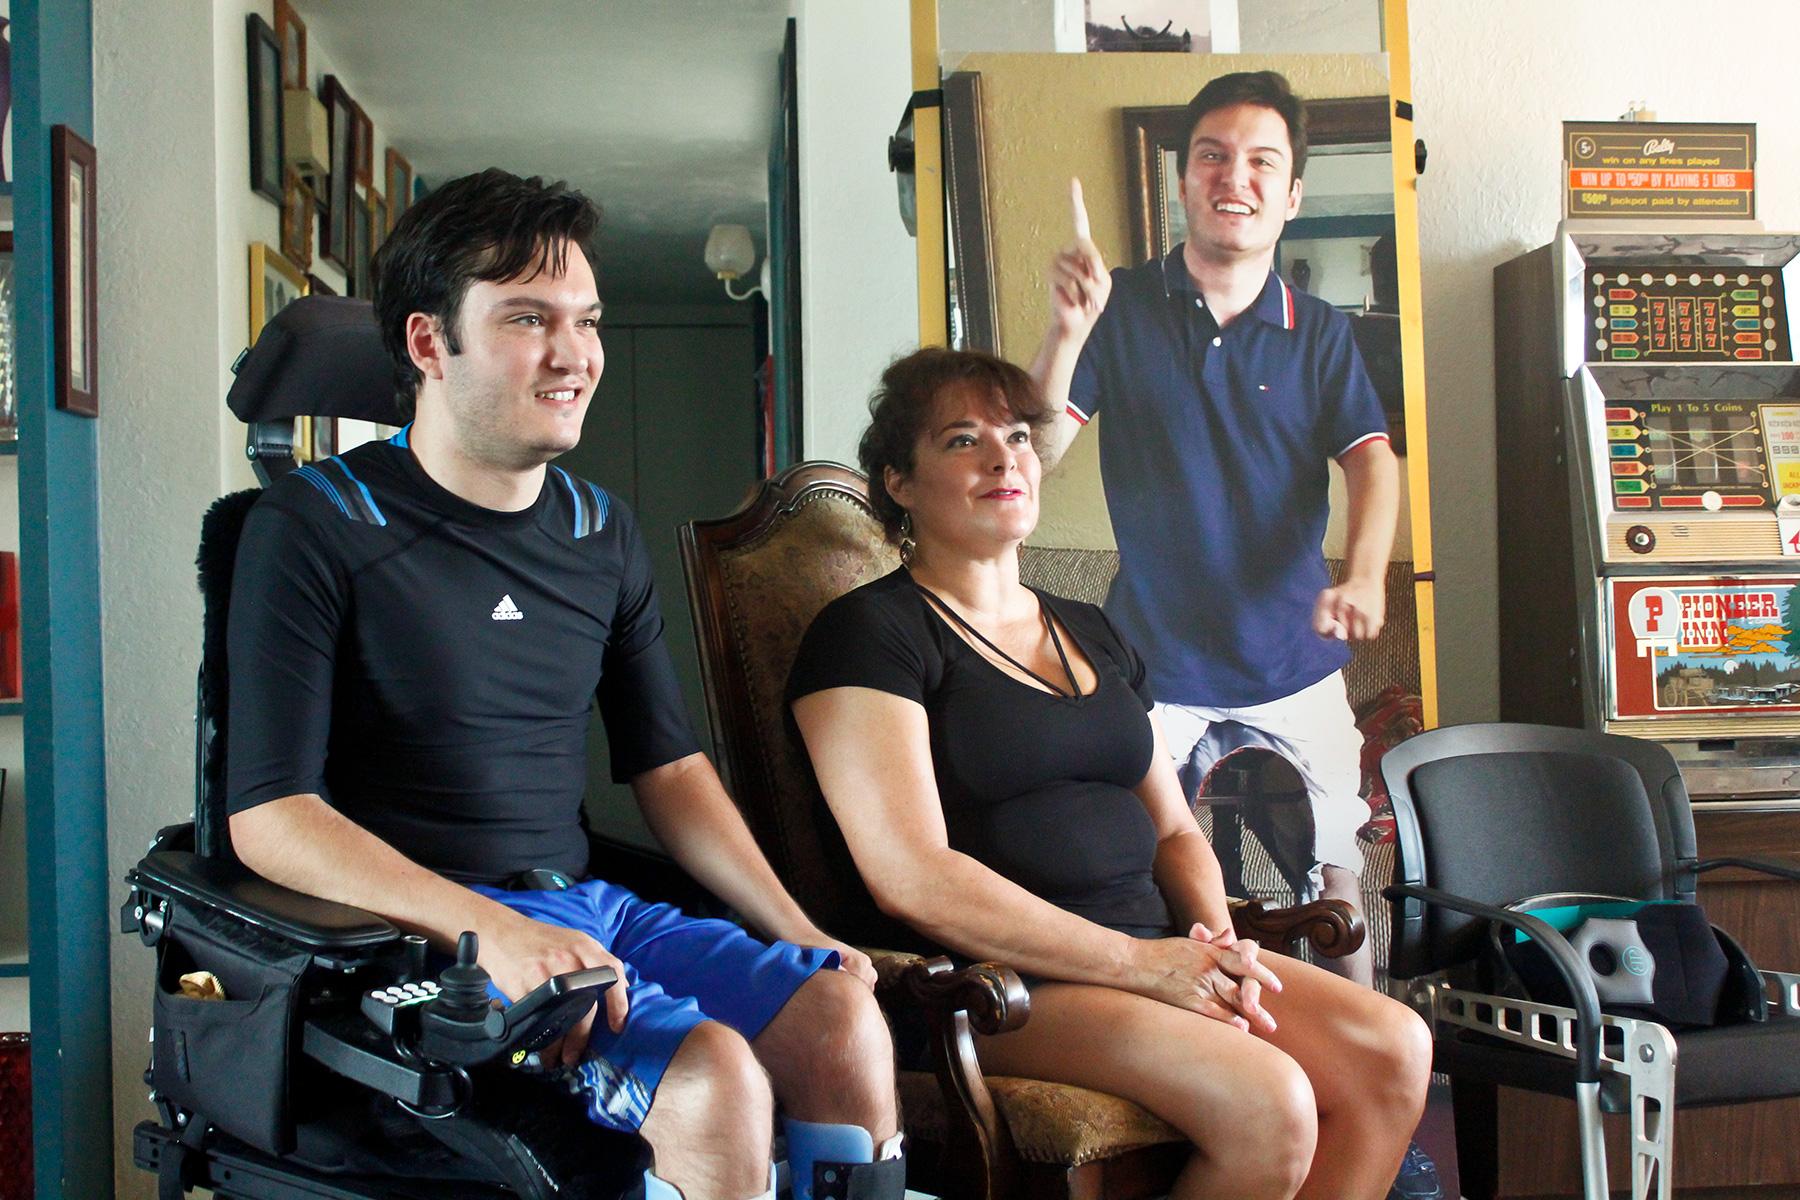 Jeffrey Bristol  and his mother, Hermelinda Bristol, at their home in Tucson, Arizona